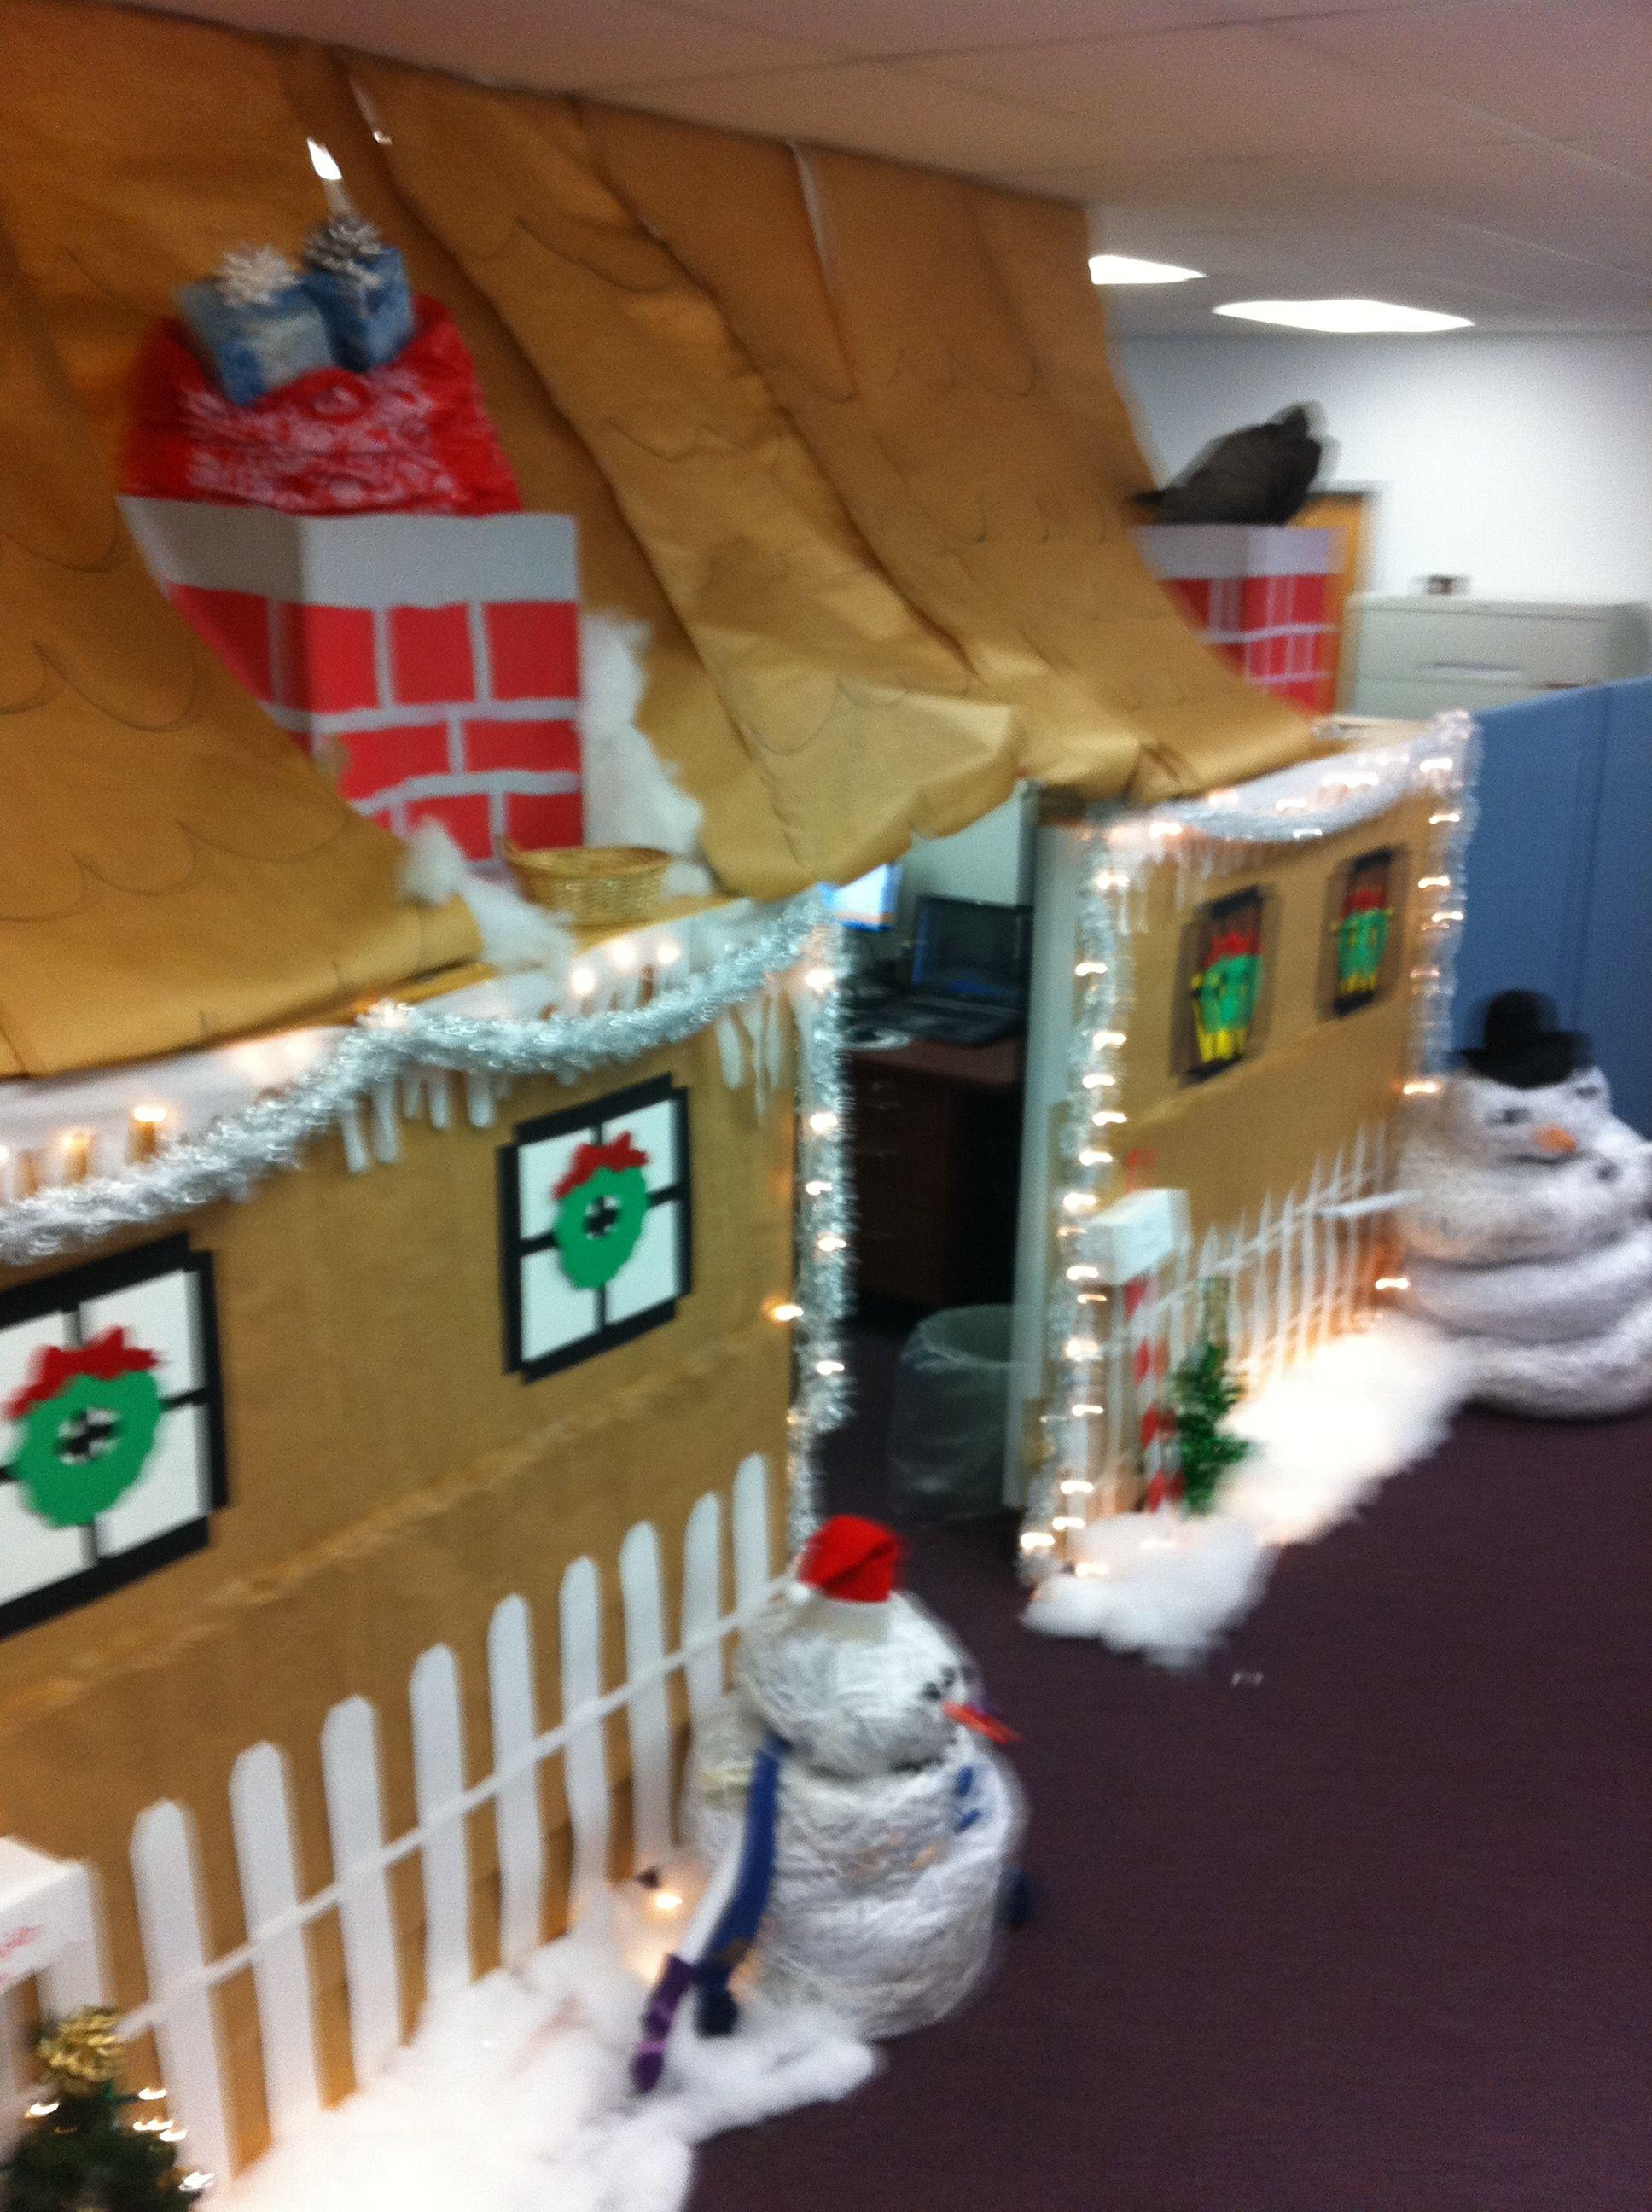 Office christmas decorations | Xmas | Pinterest | Decoration ...